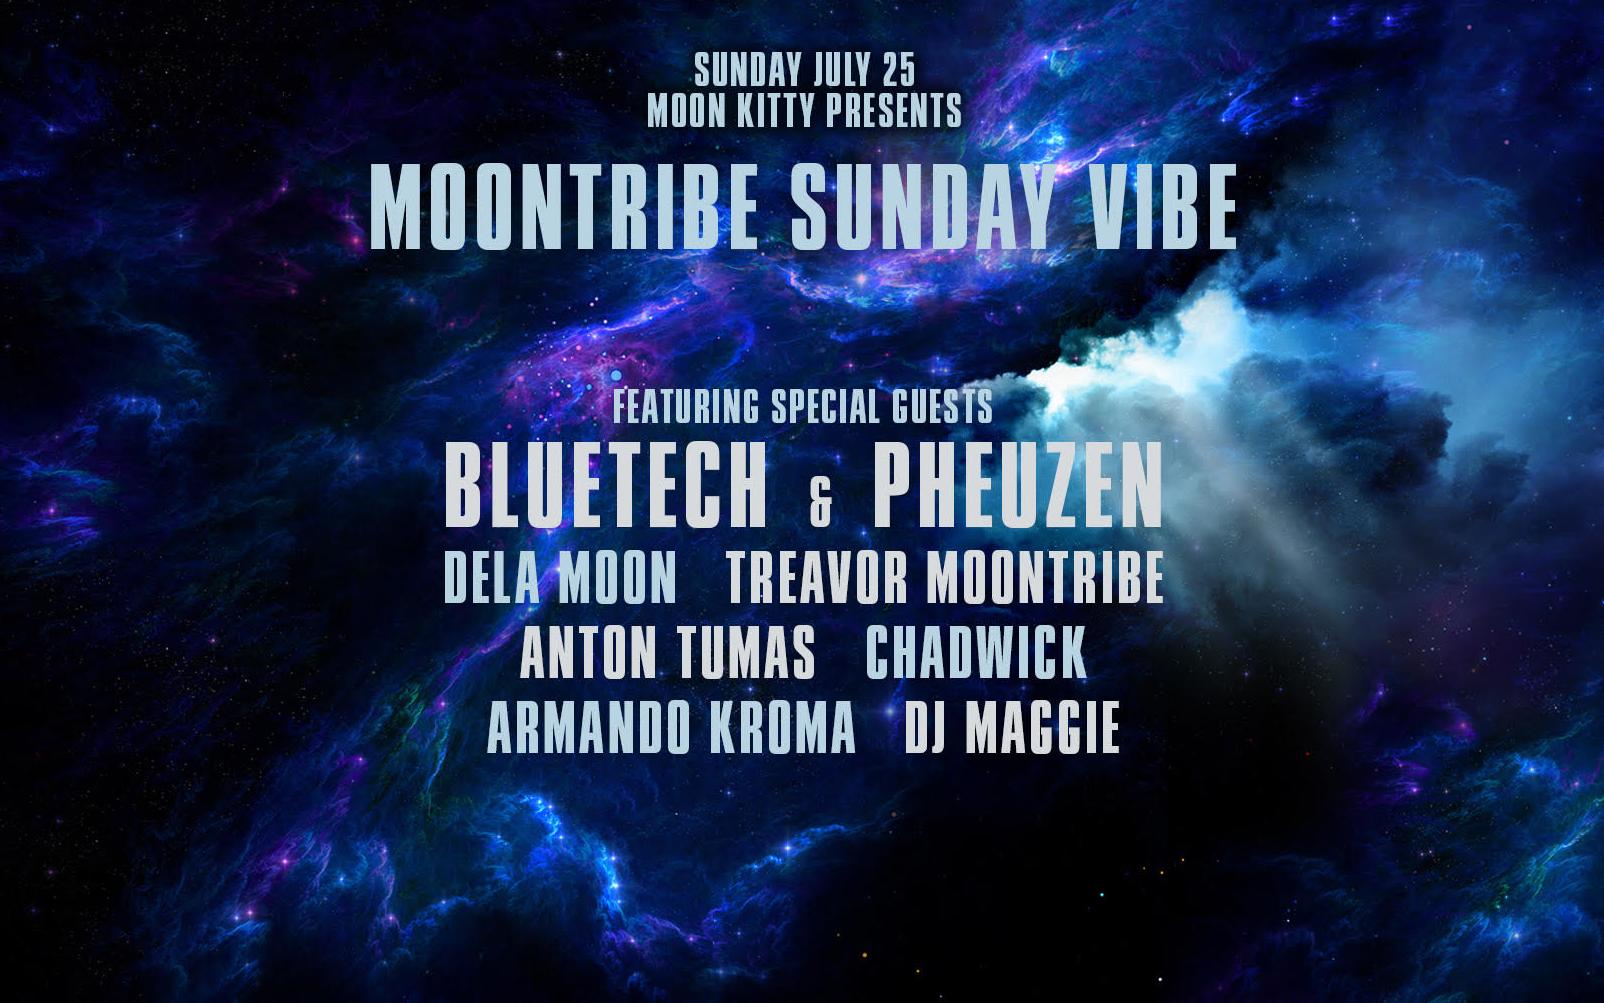 Moontribe Sunday Vibe